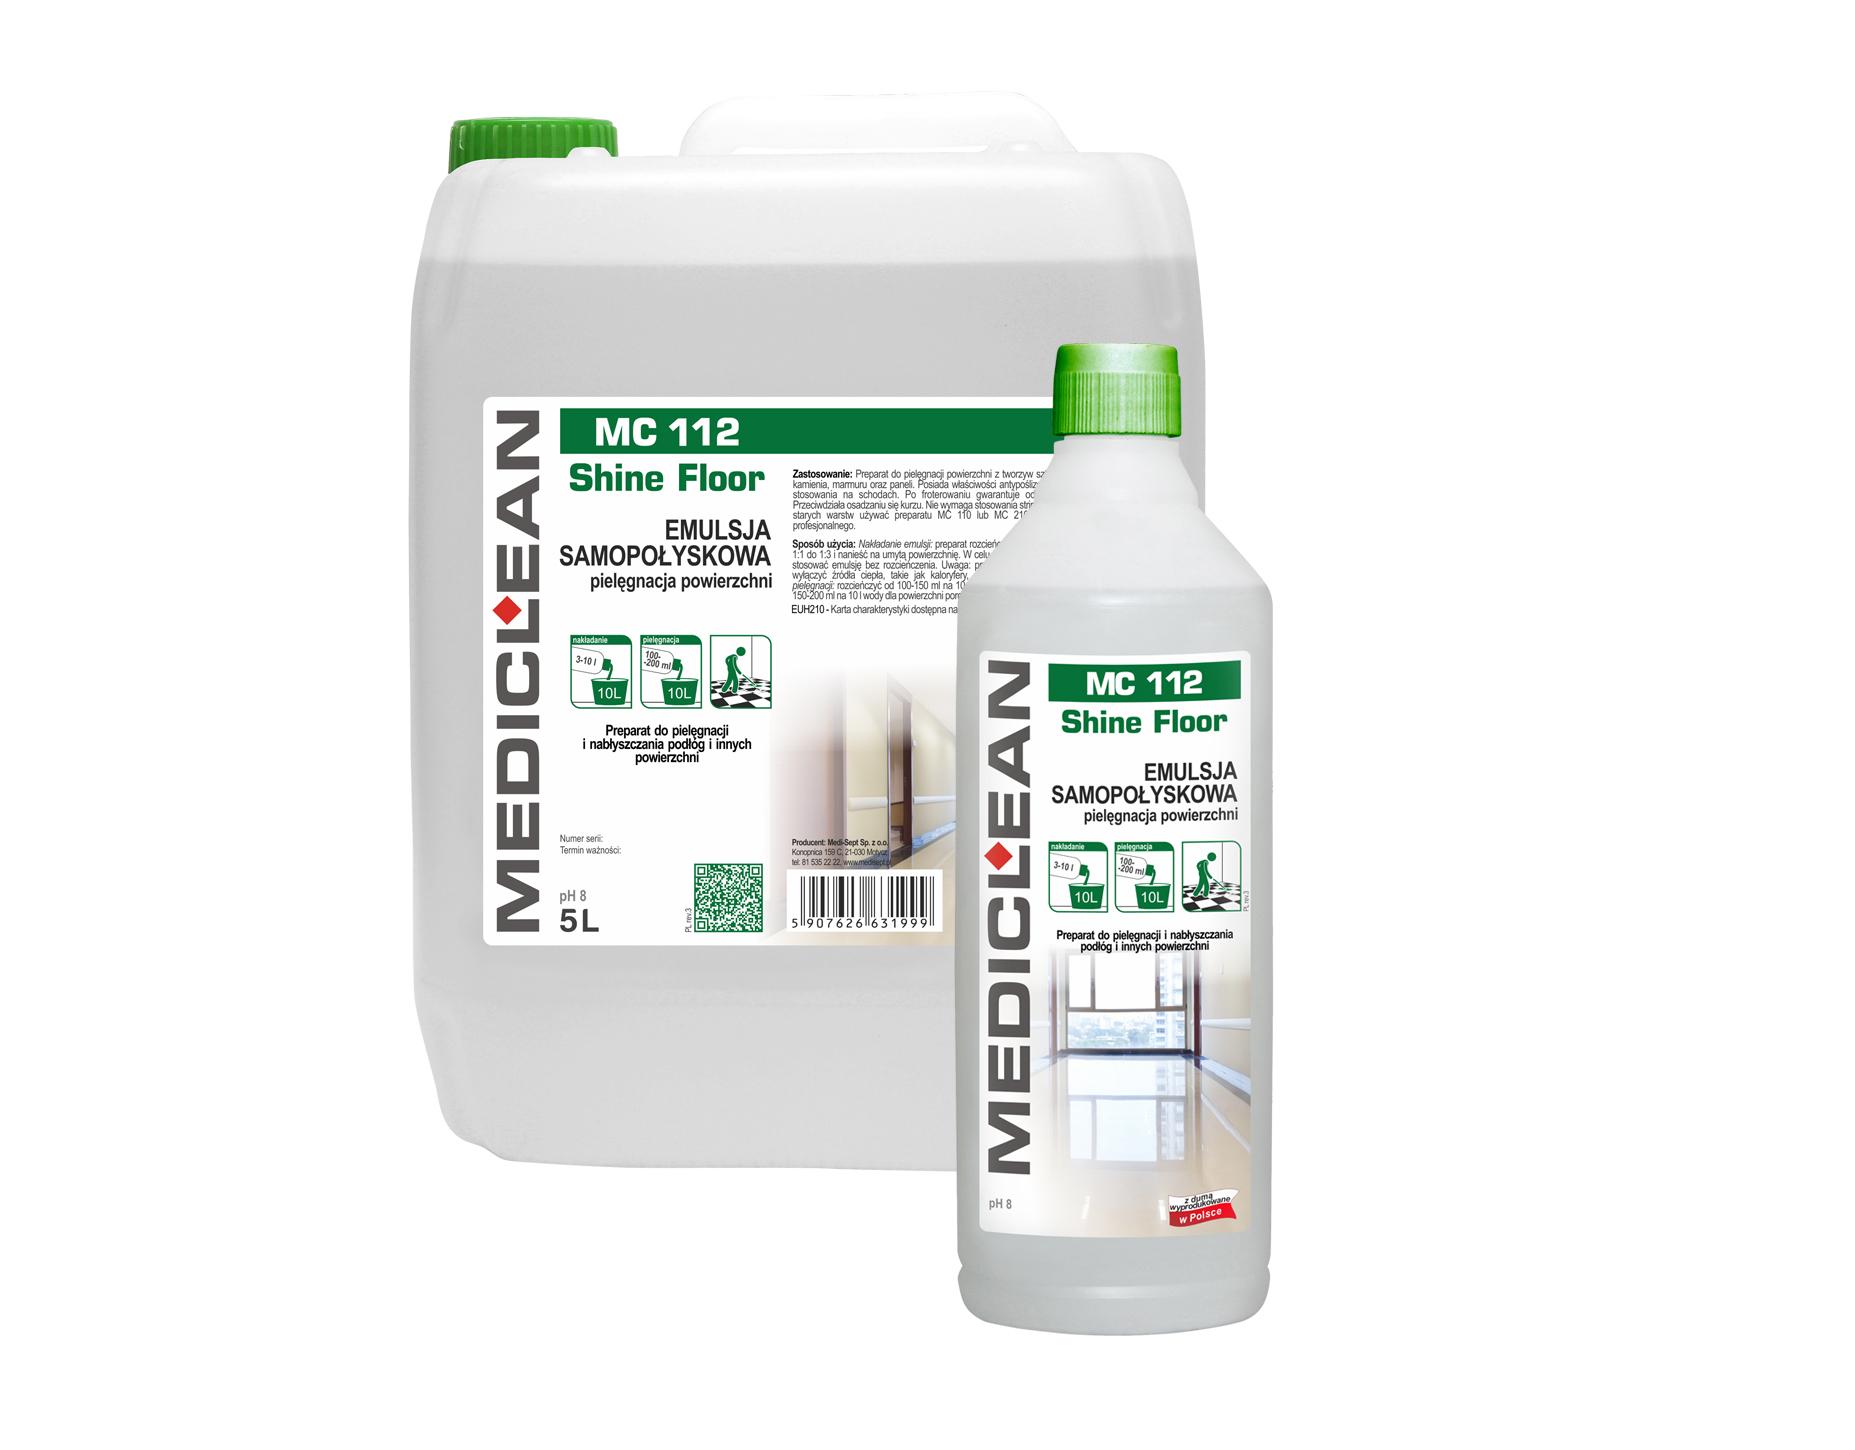 Mediclean MC 112 Shine Floor